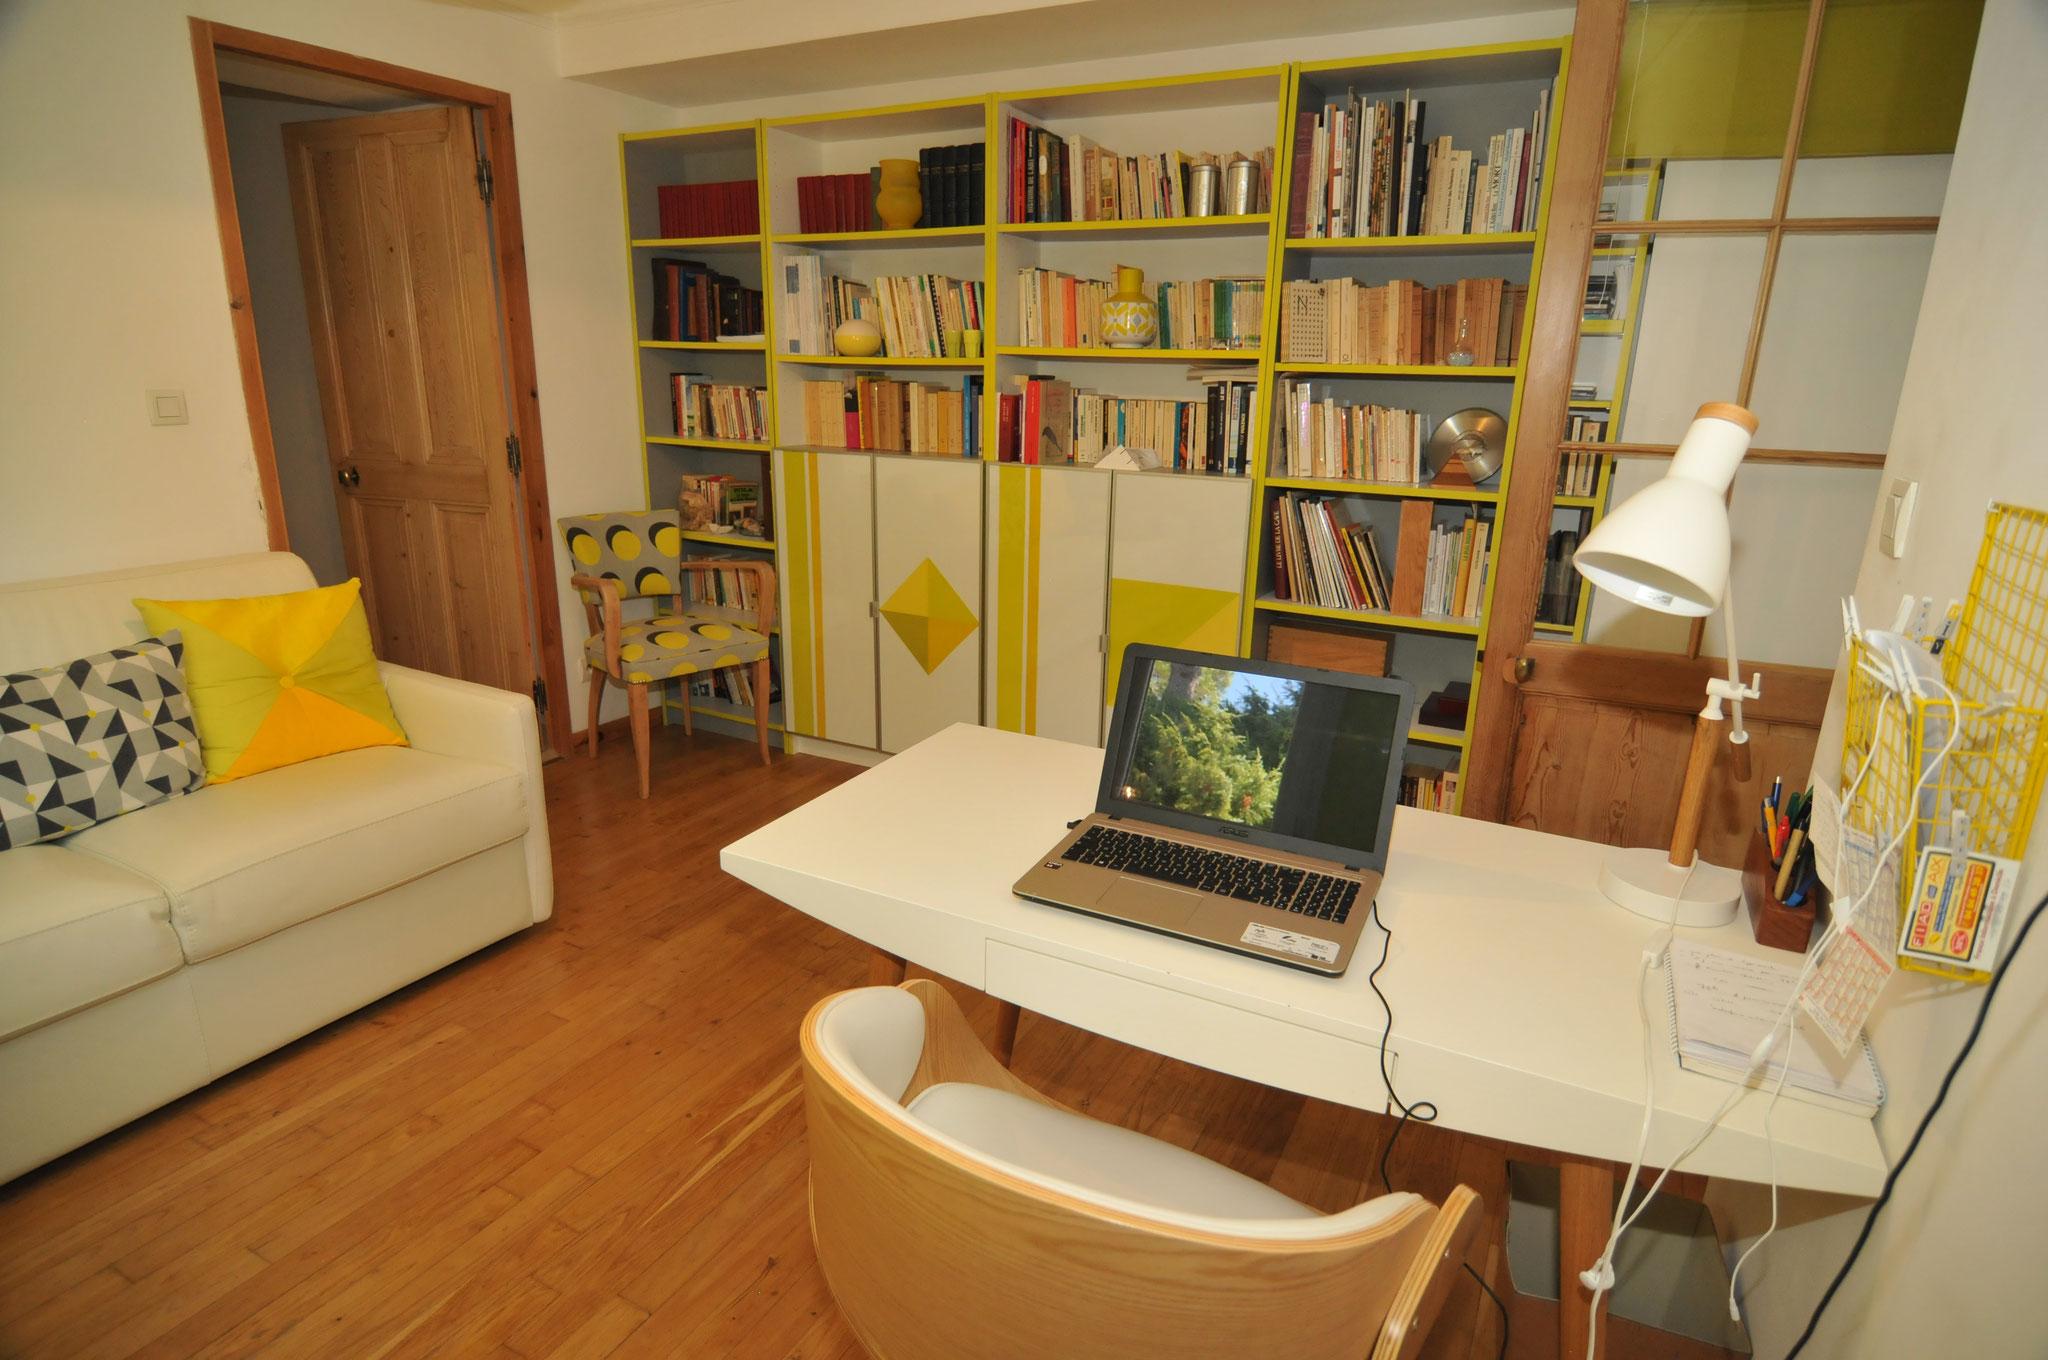 le bureau/bibliothèque